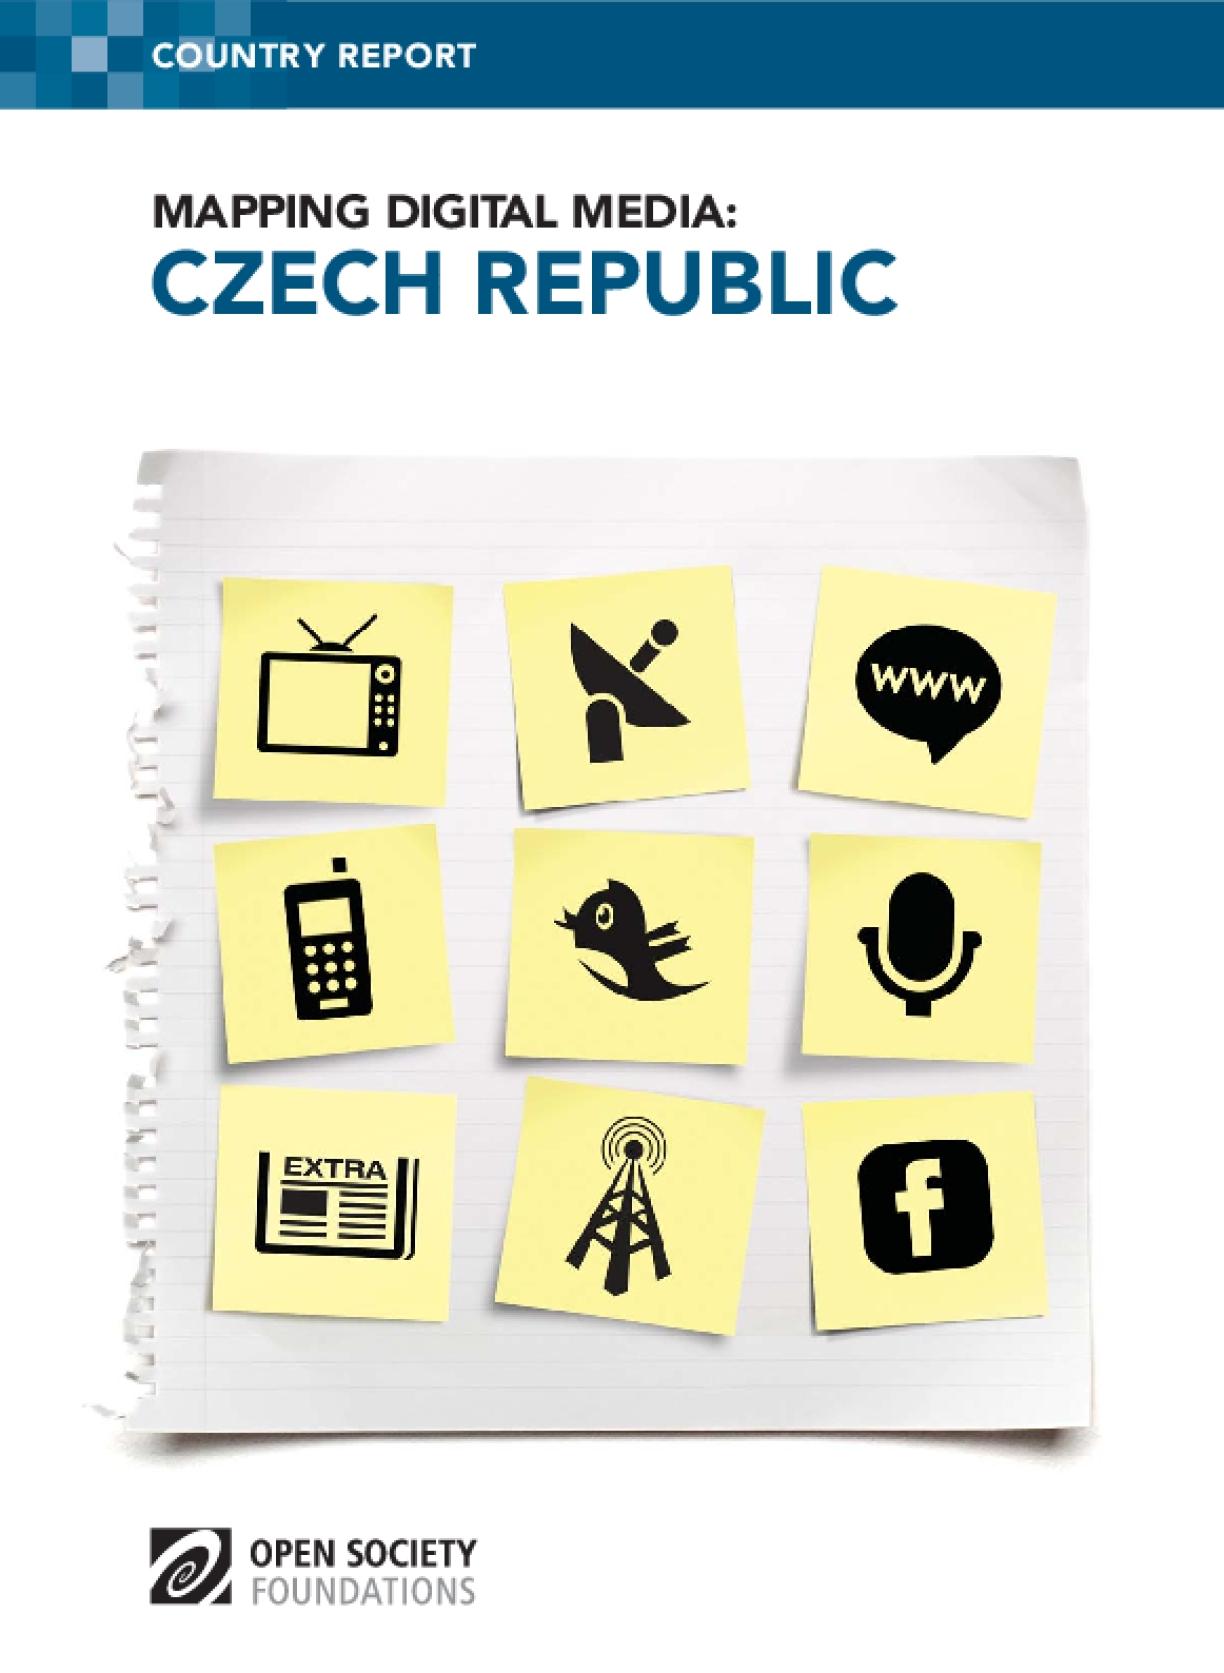 Mapping Digital Media: Czech Republic